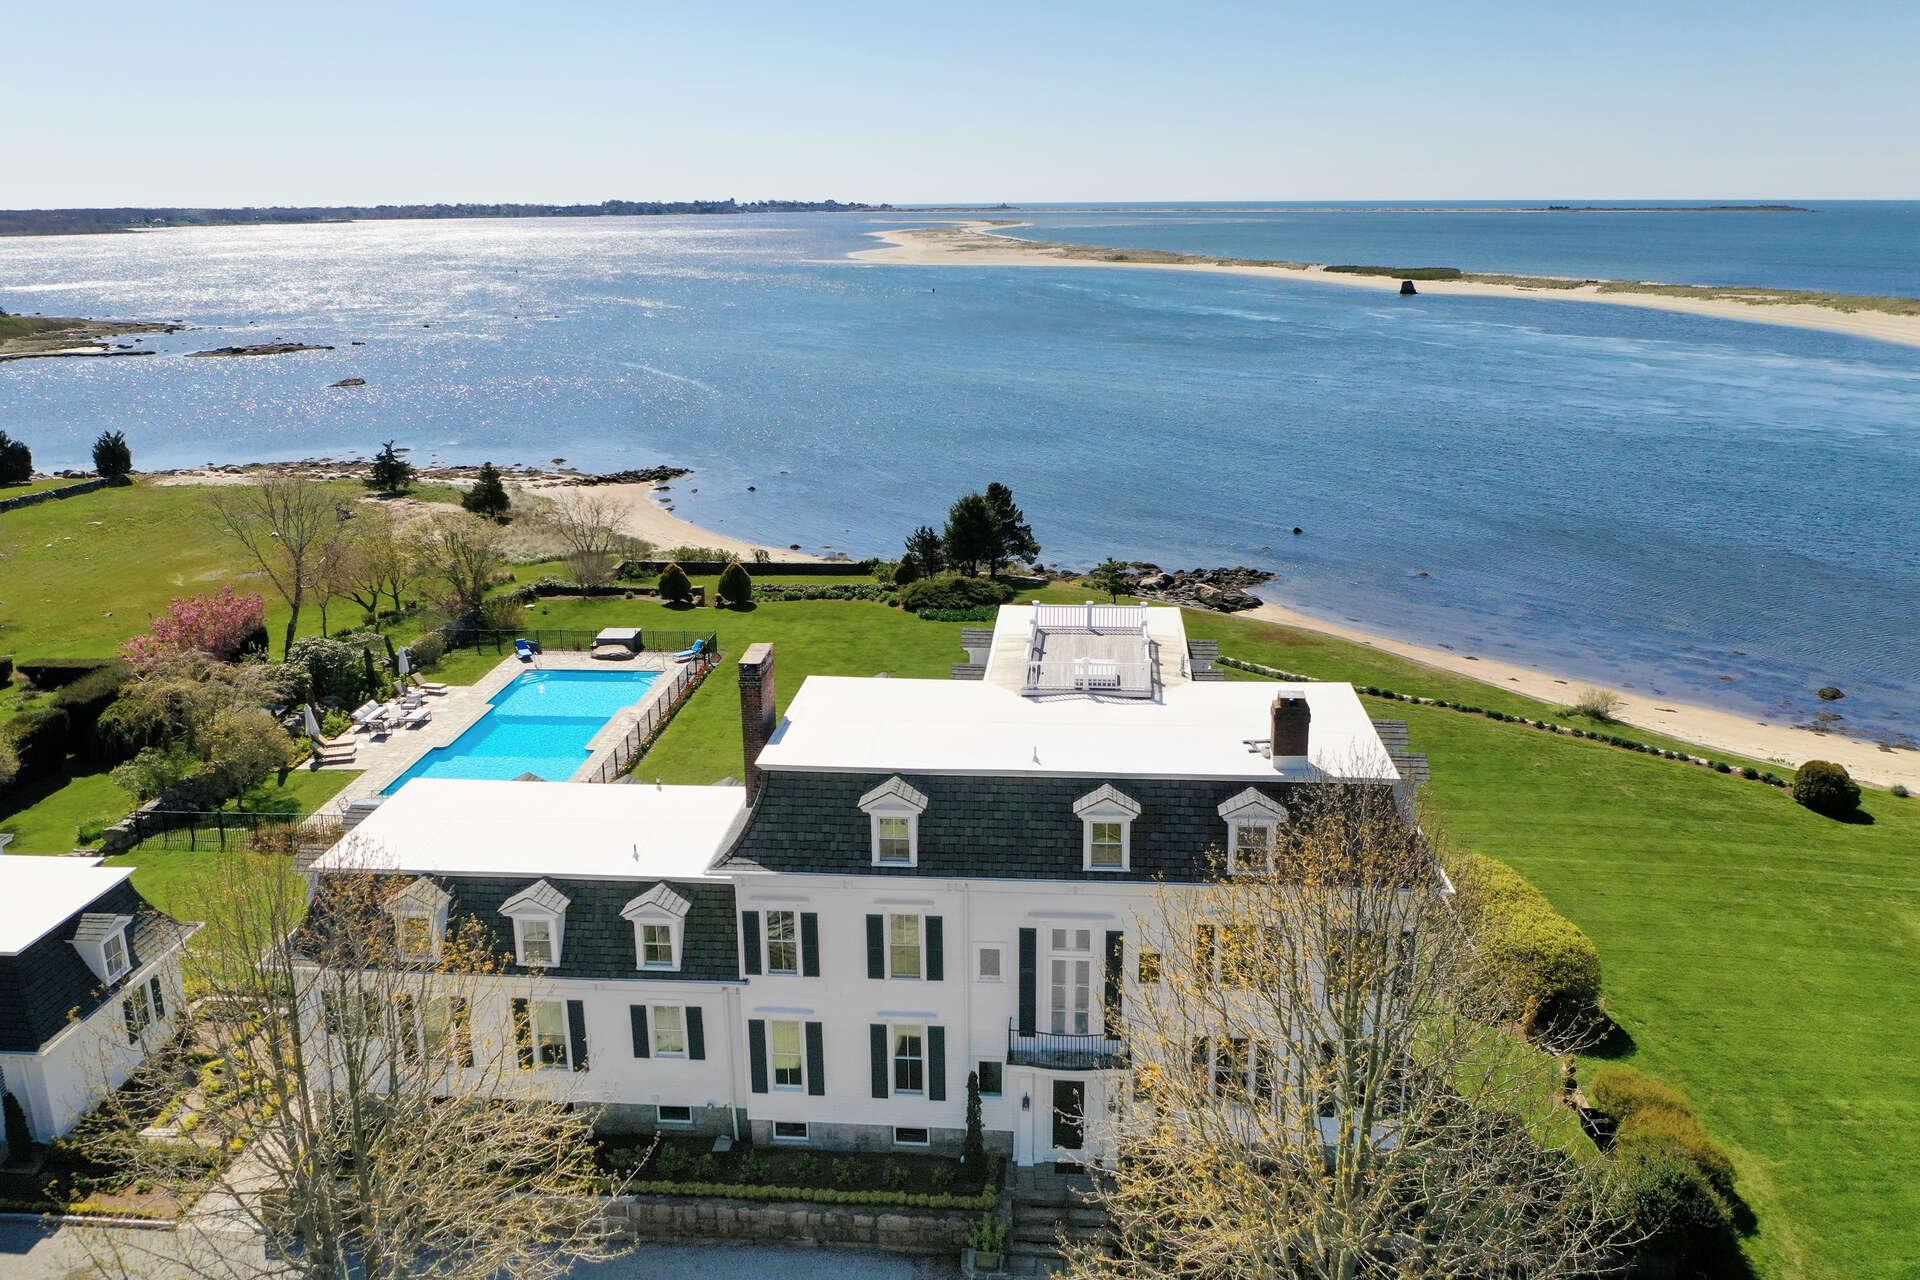 Luxury vacation rentals usa - Connecticut - Stonington - No location 4 - Salt Acres - Image 1/46